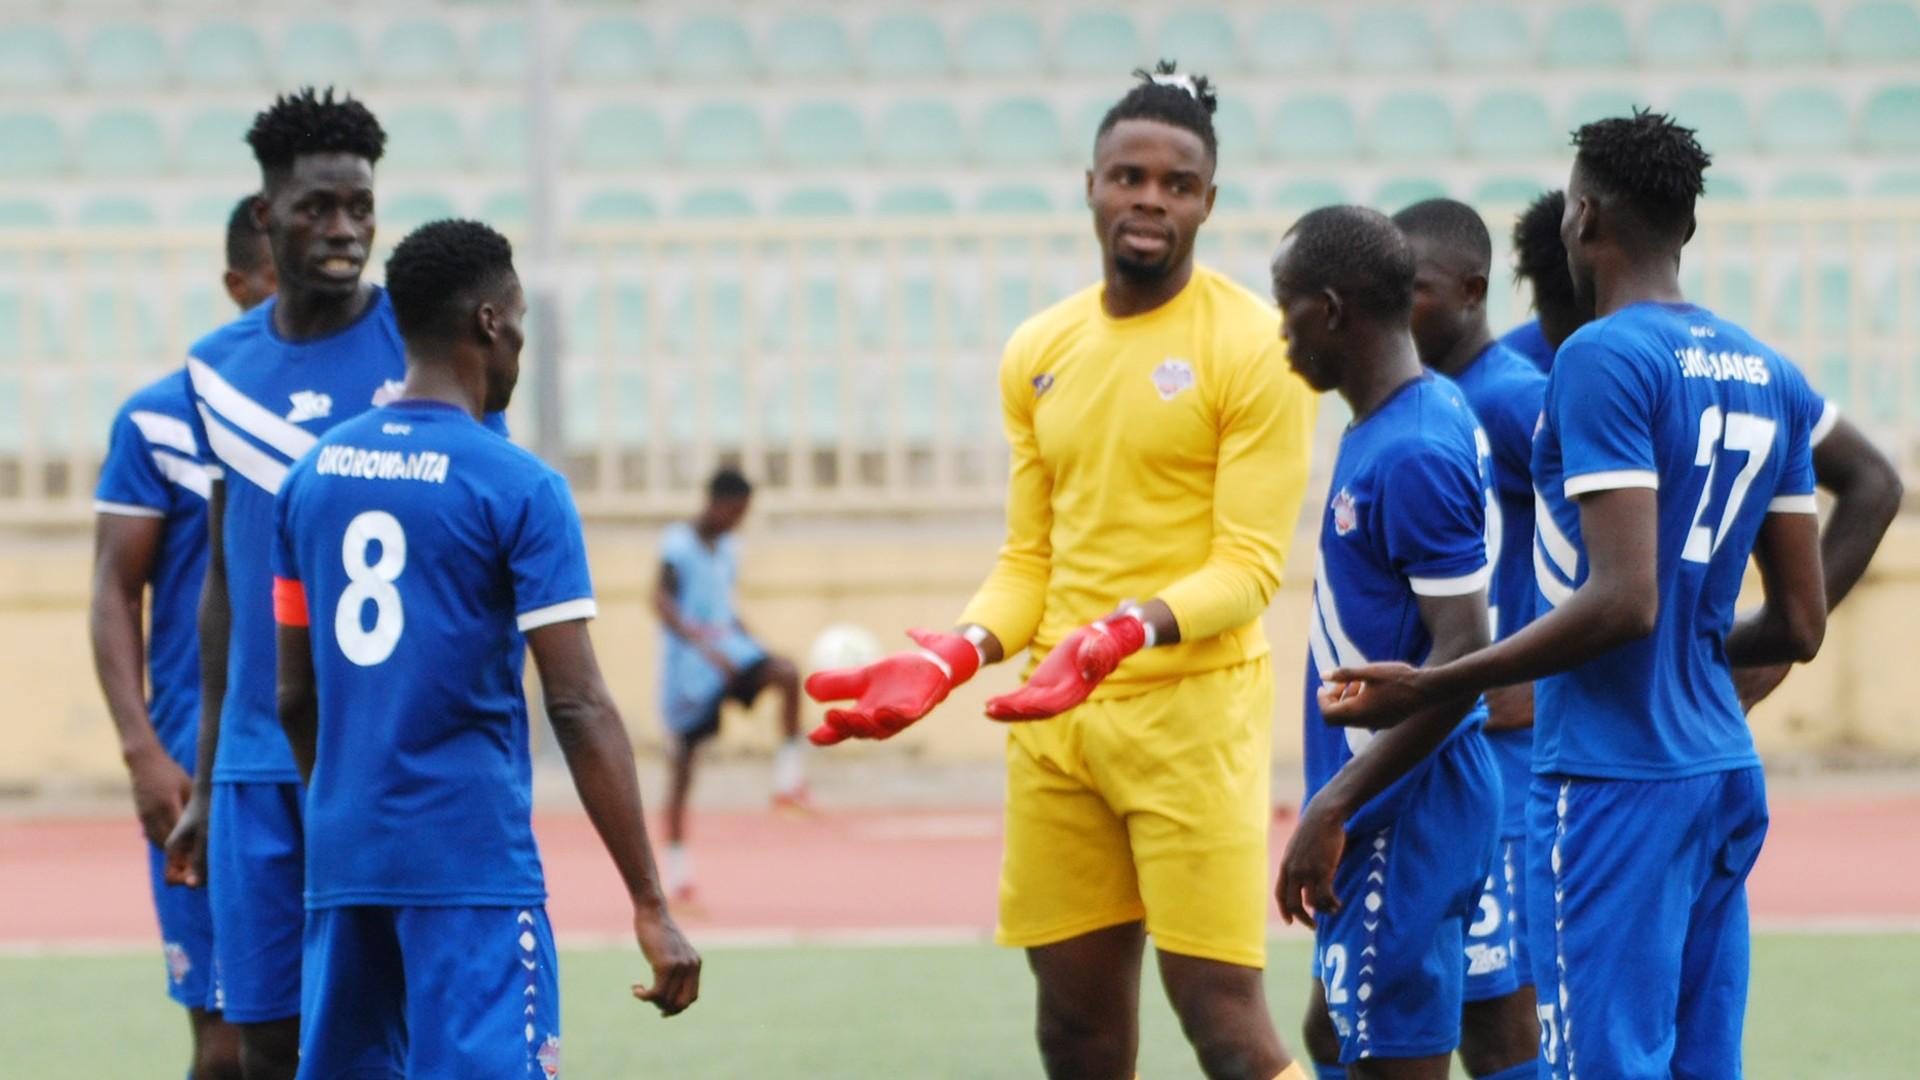 Caf Confederation Cup: Beniangba propels Bayelsa United past CS Sfaxien